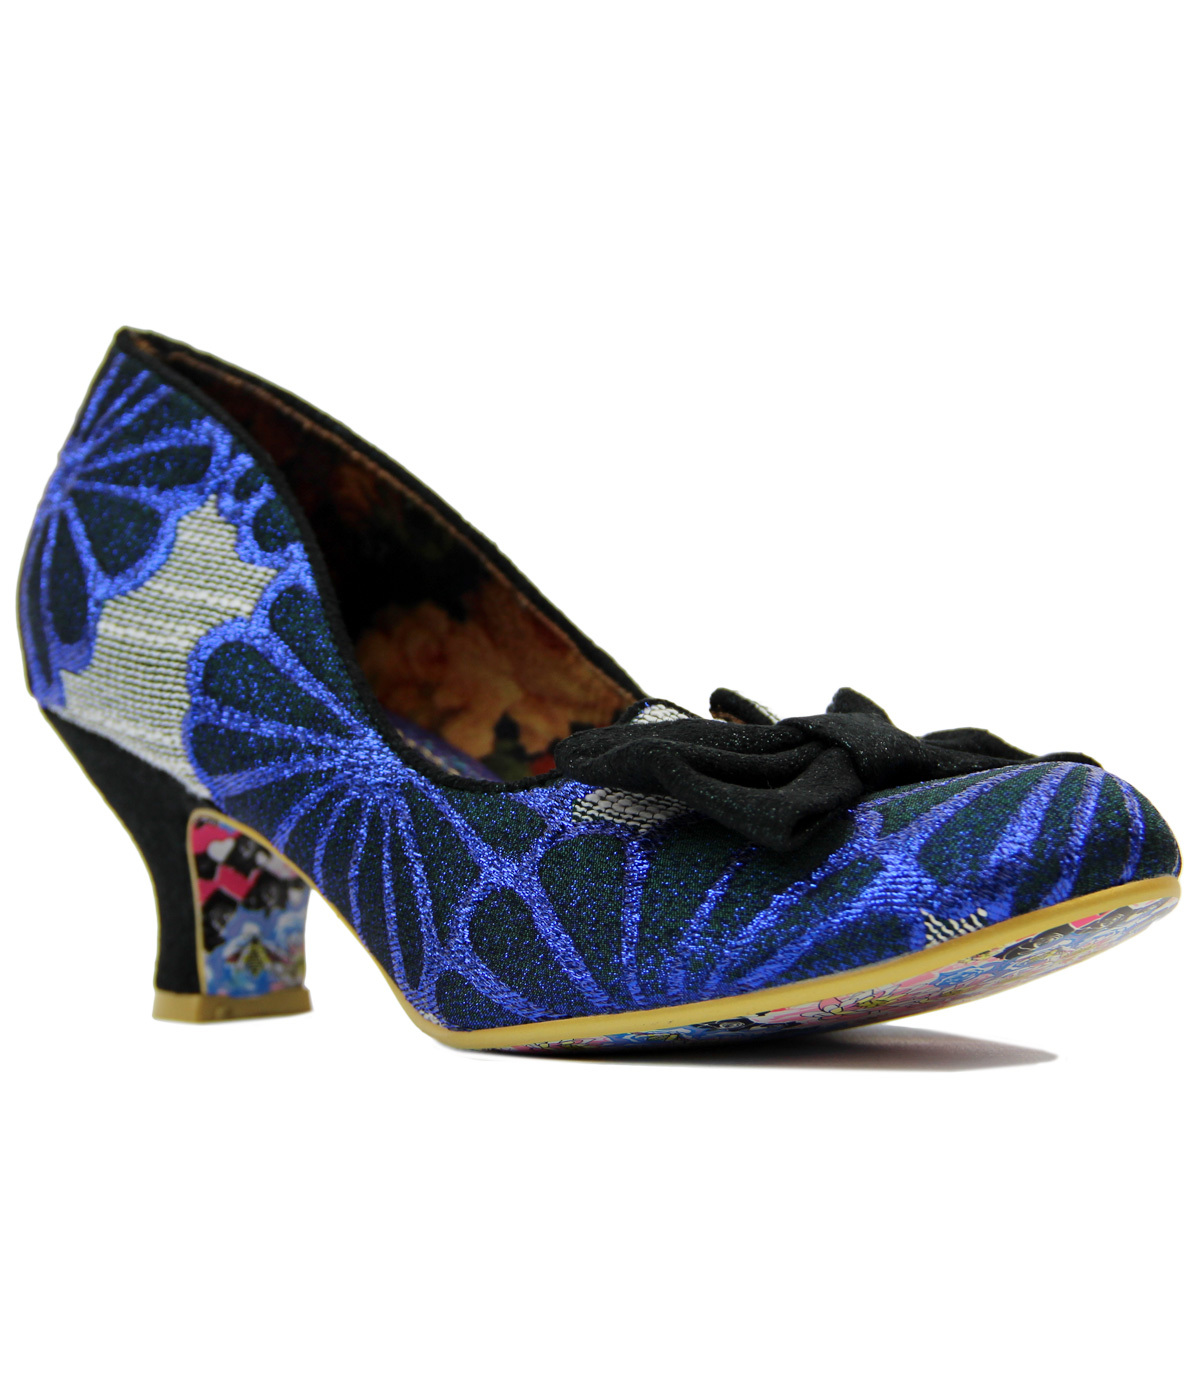 c9402eec046 Dazzle Razzle IRREGULAR CHOICE Retro Vintage Heels